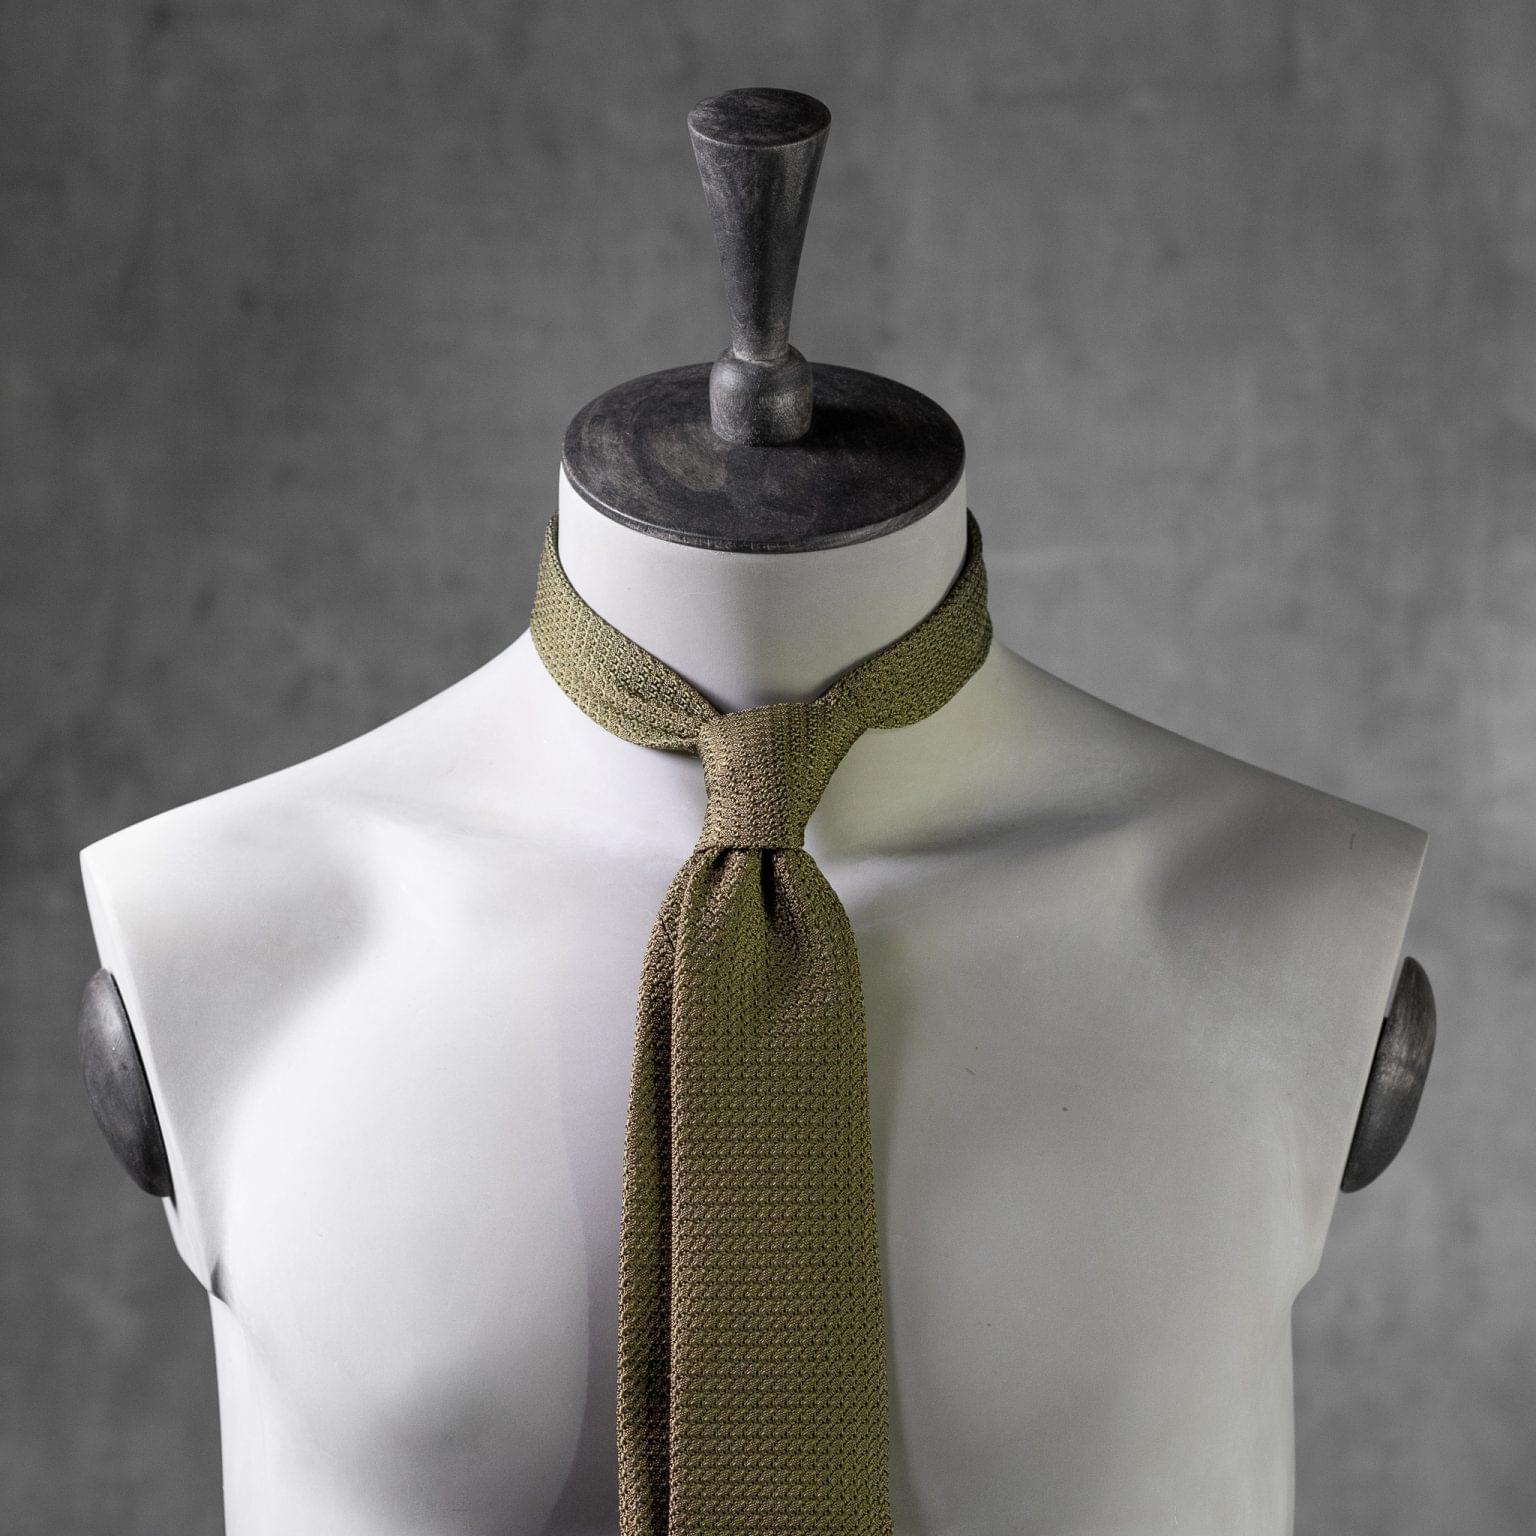 GRENADINE-0145-Tie-Initials-Corbata-Iniciales-The-Seelk-3